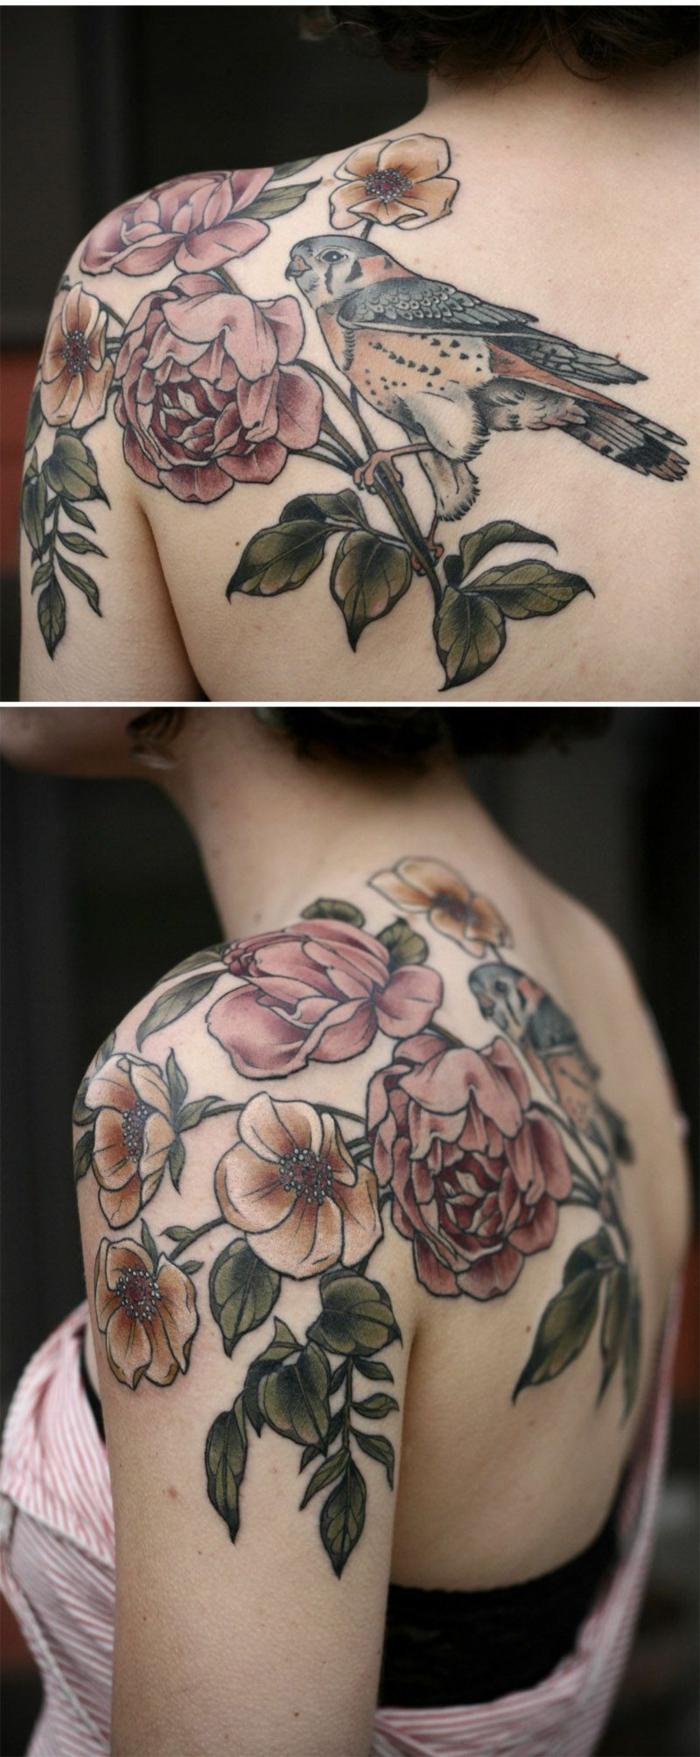 tatuajes tradicionales con motivos florales,grande tatuaje en la espalda, tattoo con peonias, tatujes old school golondrinas